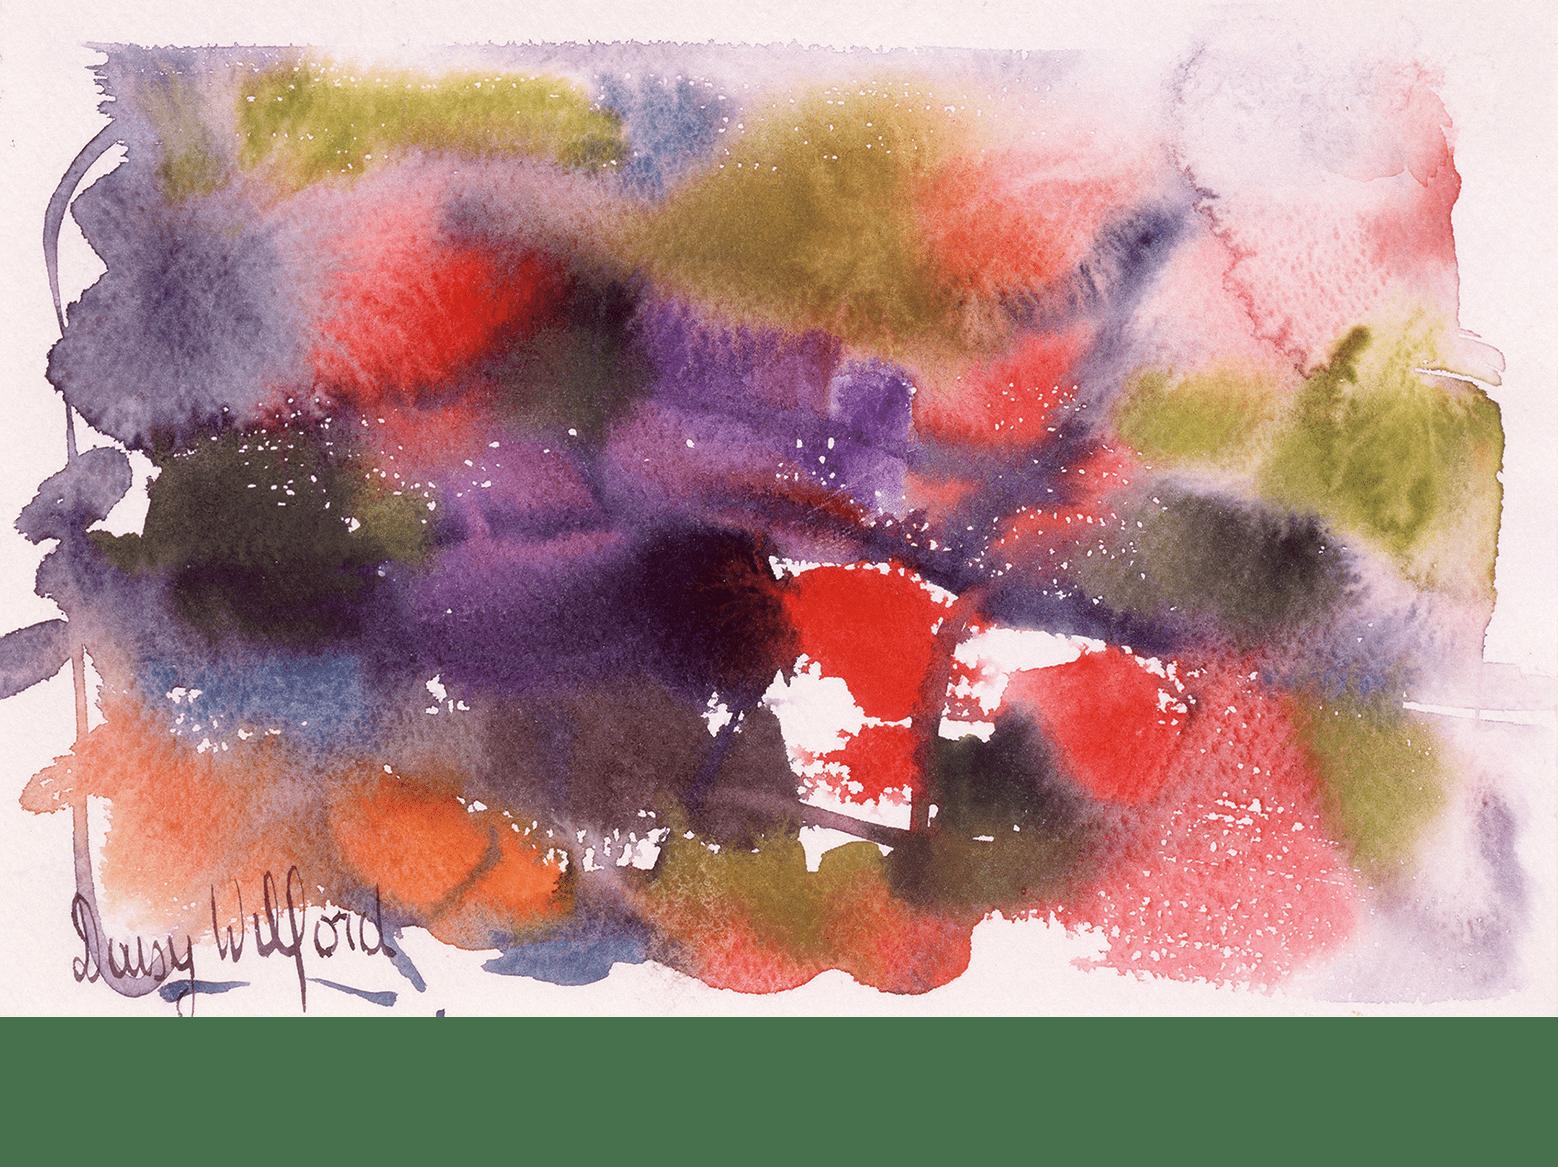 Le sol du chemin (1986)